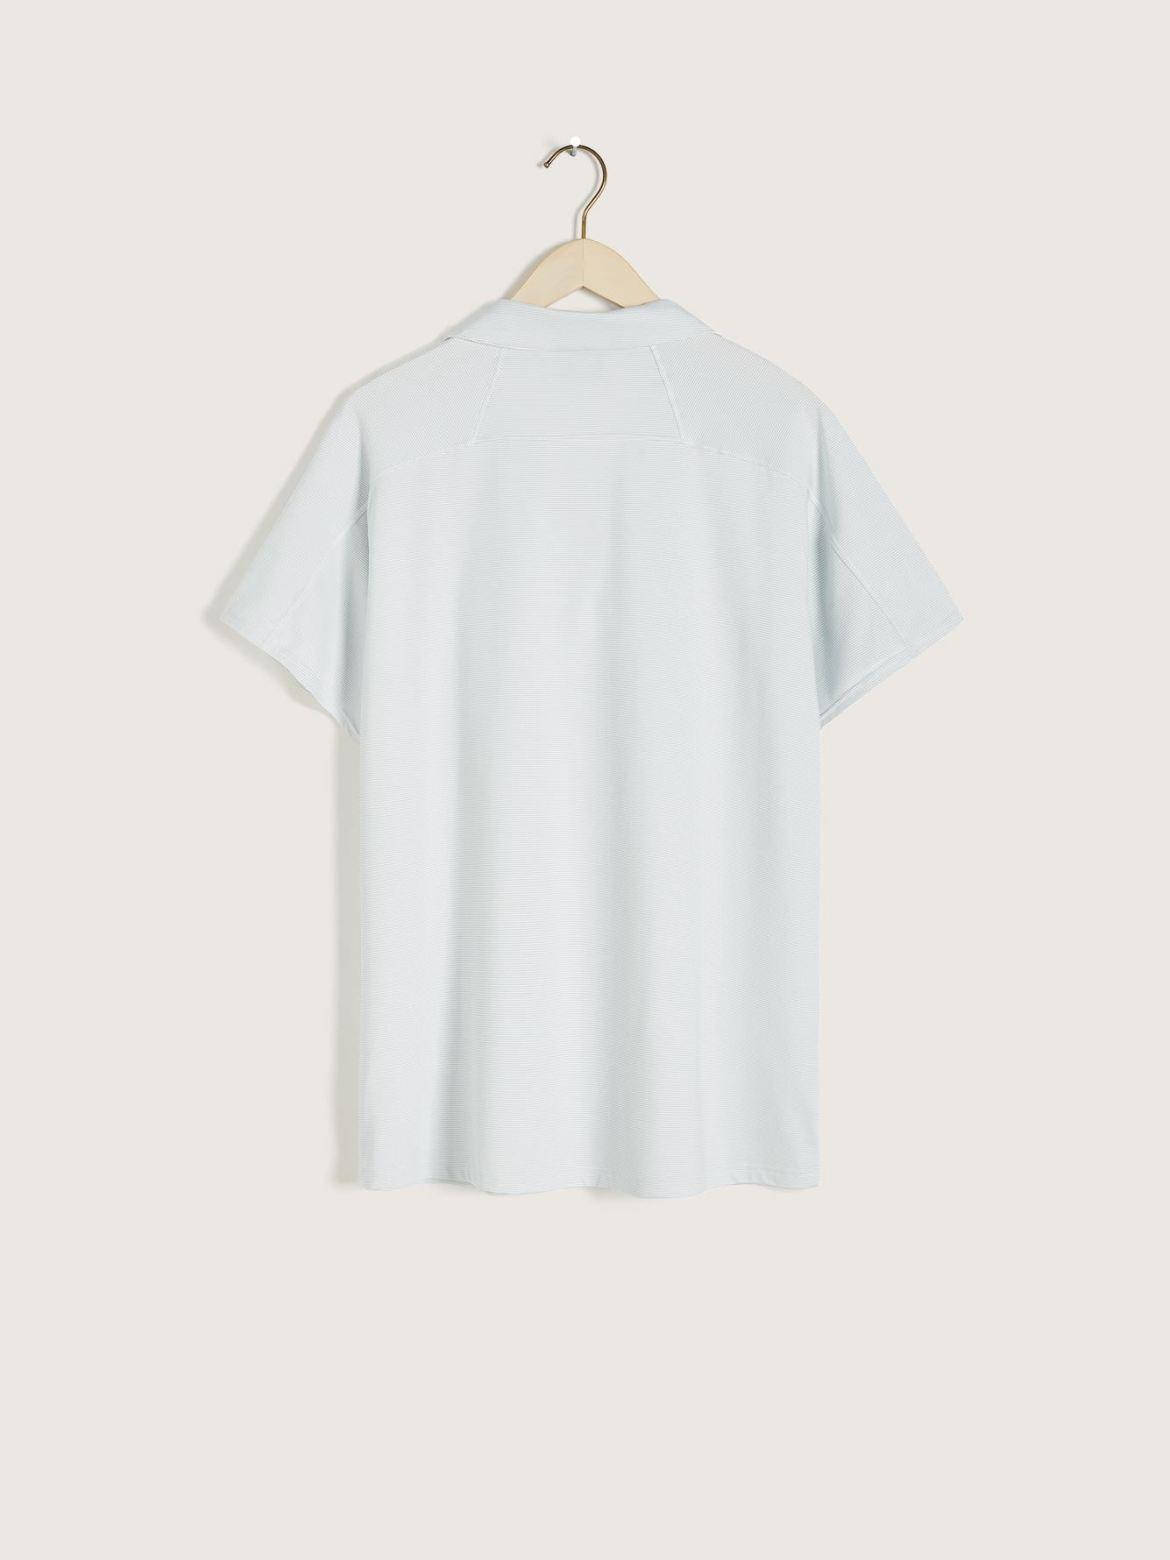 Firwood Camp II Polo T-Shirt - Columbia